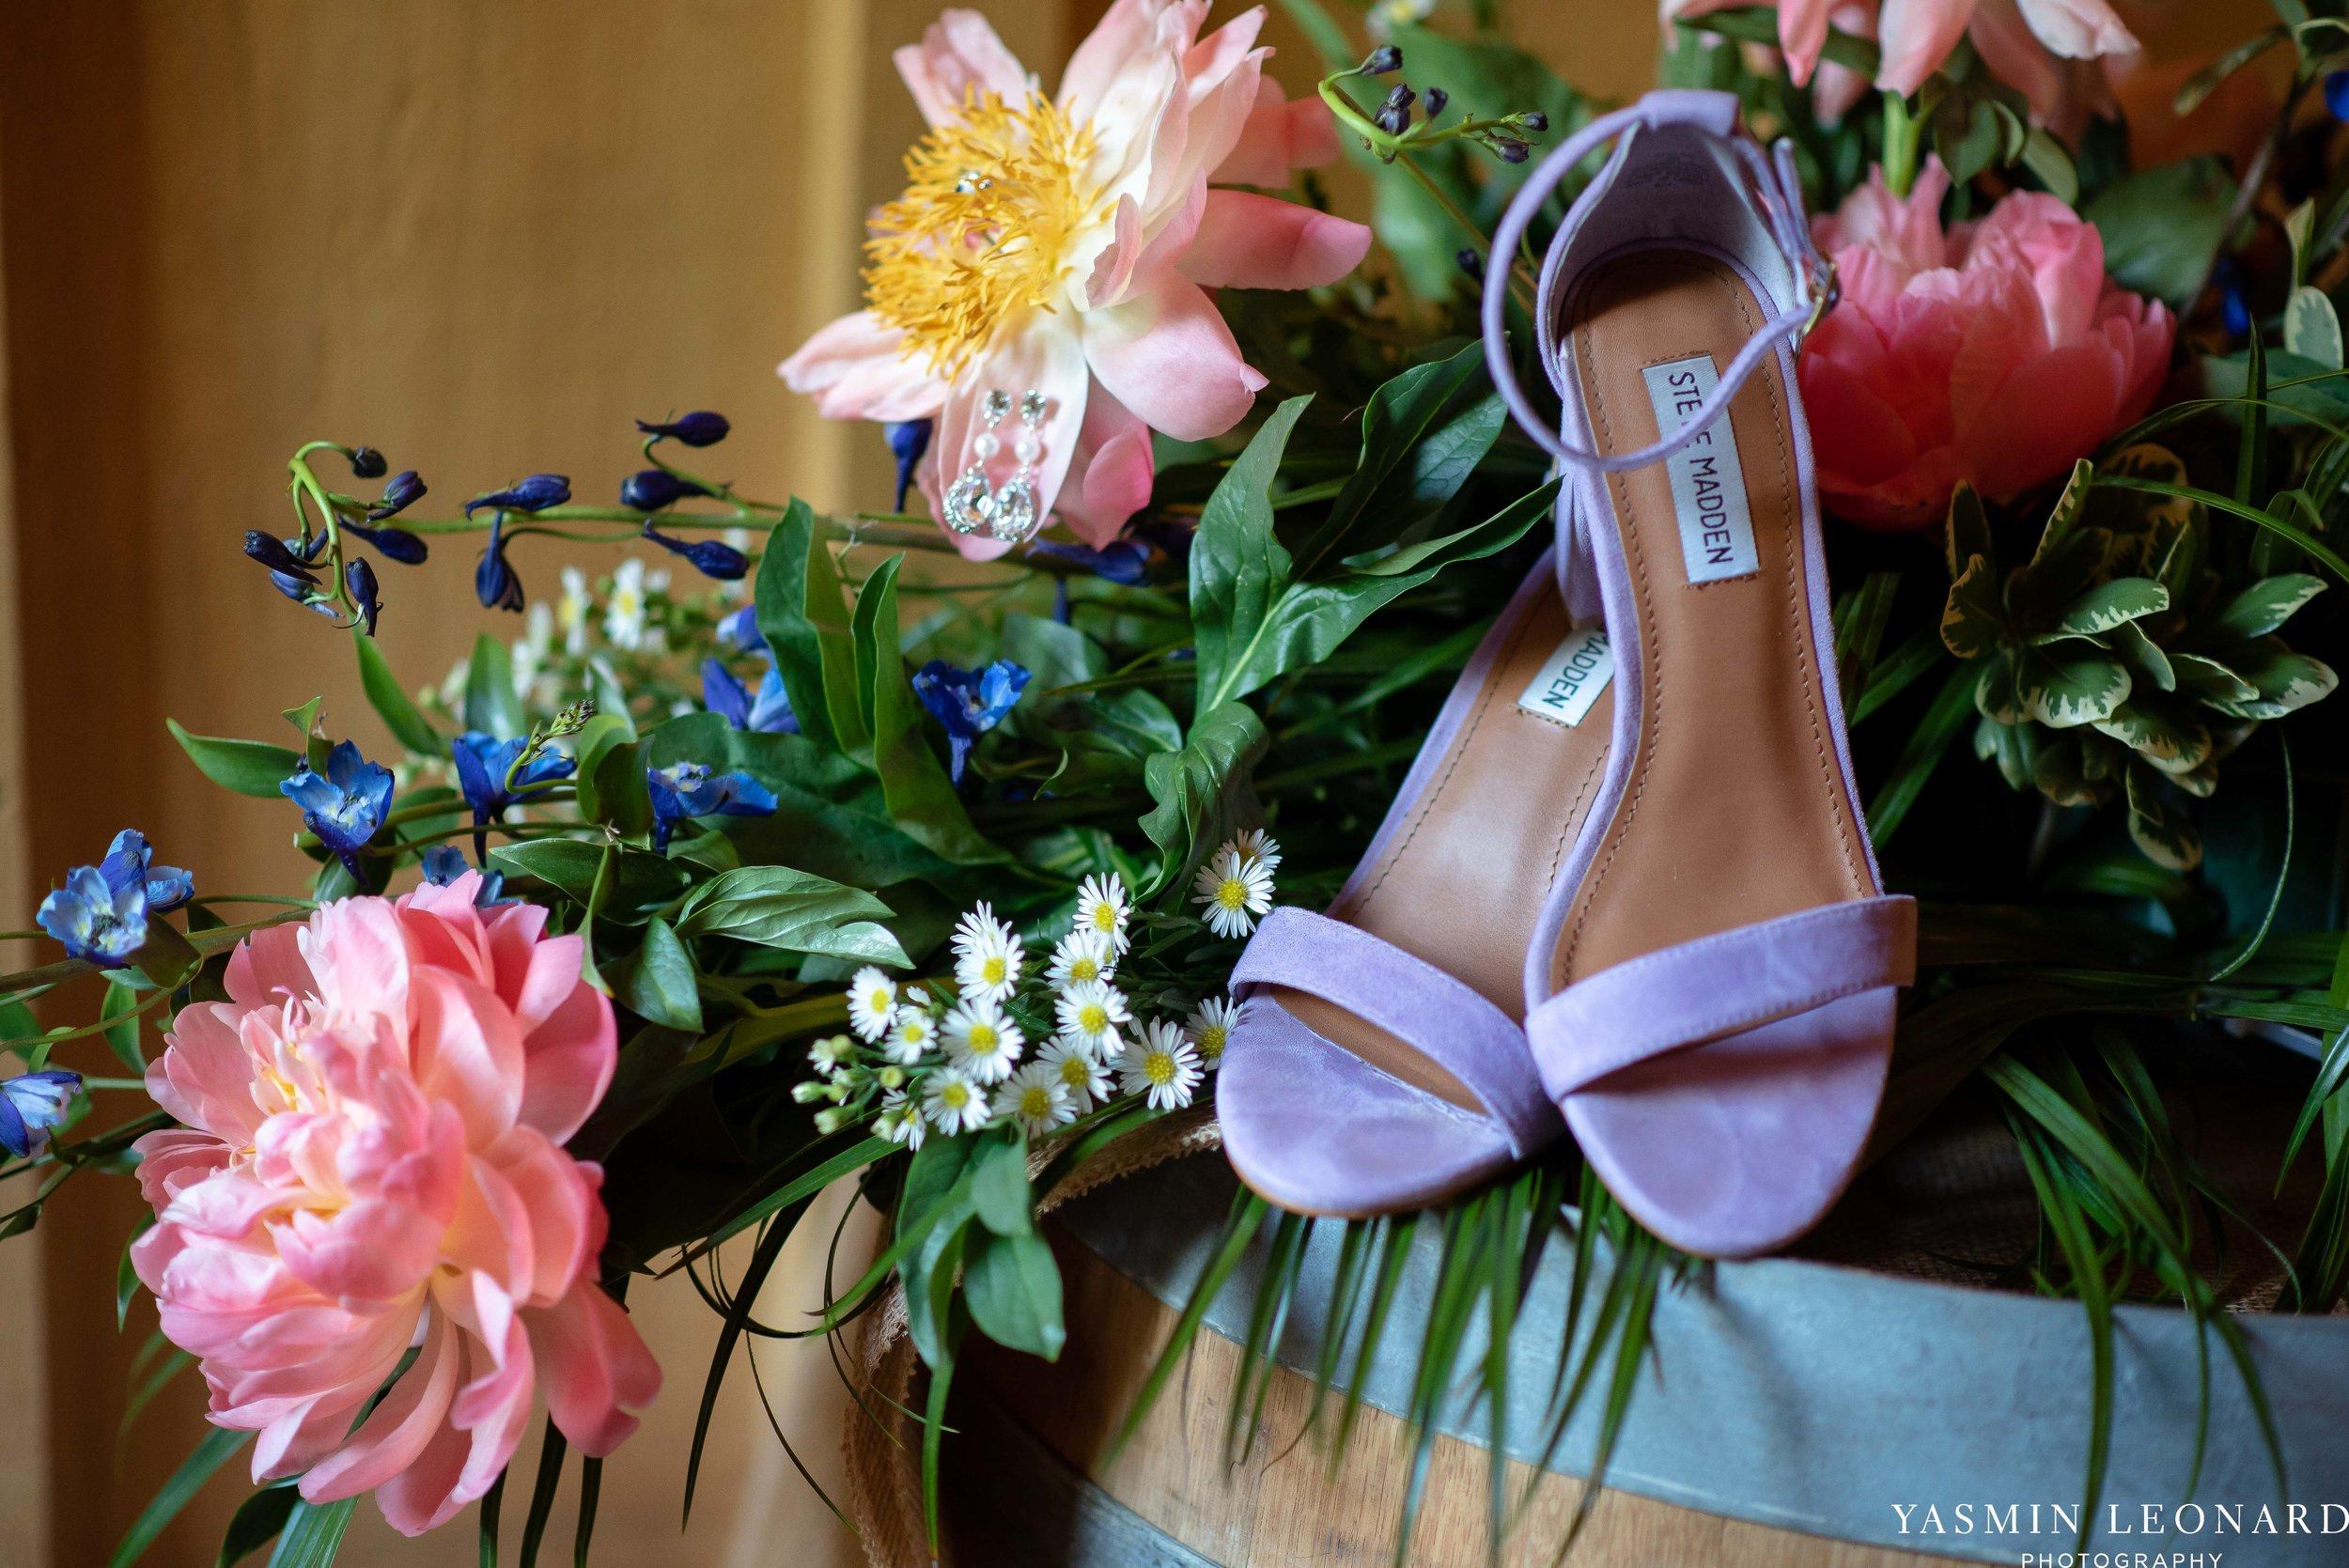 Old Homeplace Vineyard - NC Weddings - Outdoor Summer Weddings - Peony Boutique - Vineyard Wedding - NC Photographer - Yasmin Leonard Photography-4.jpg